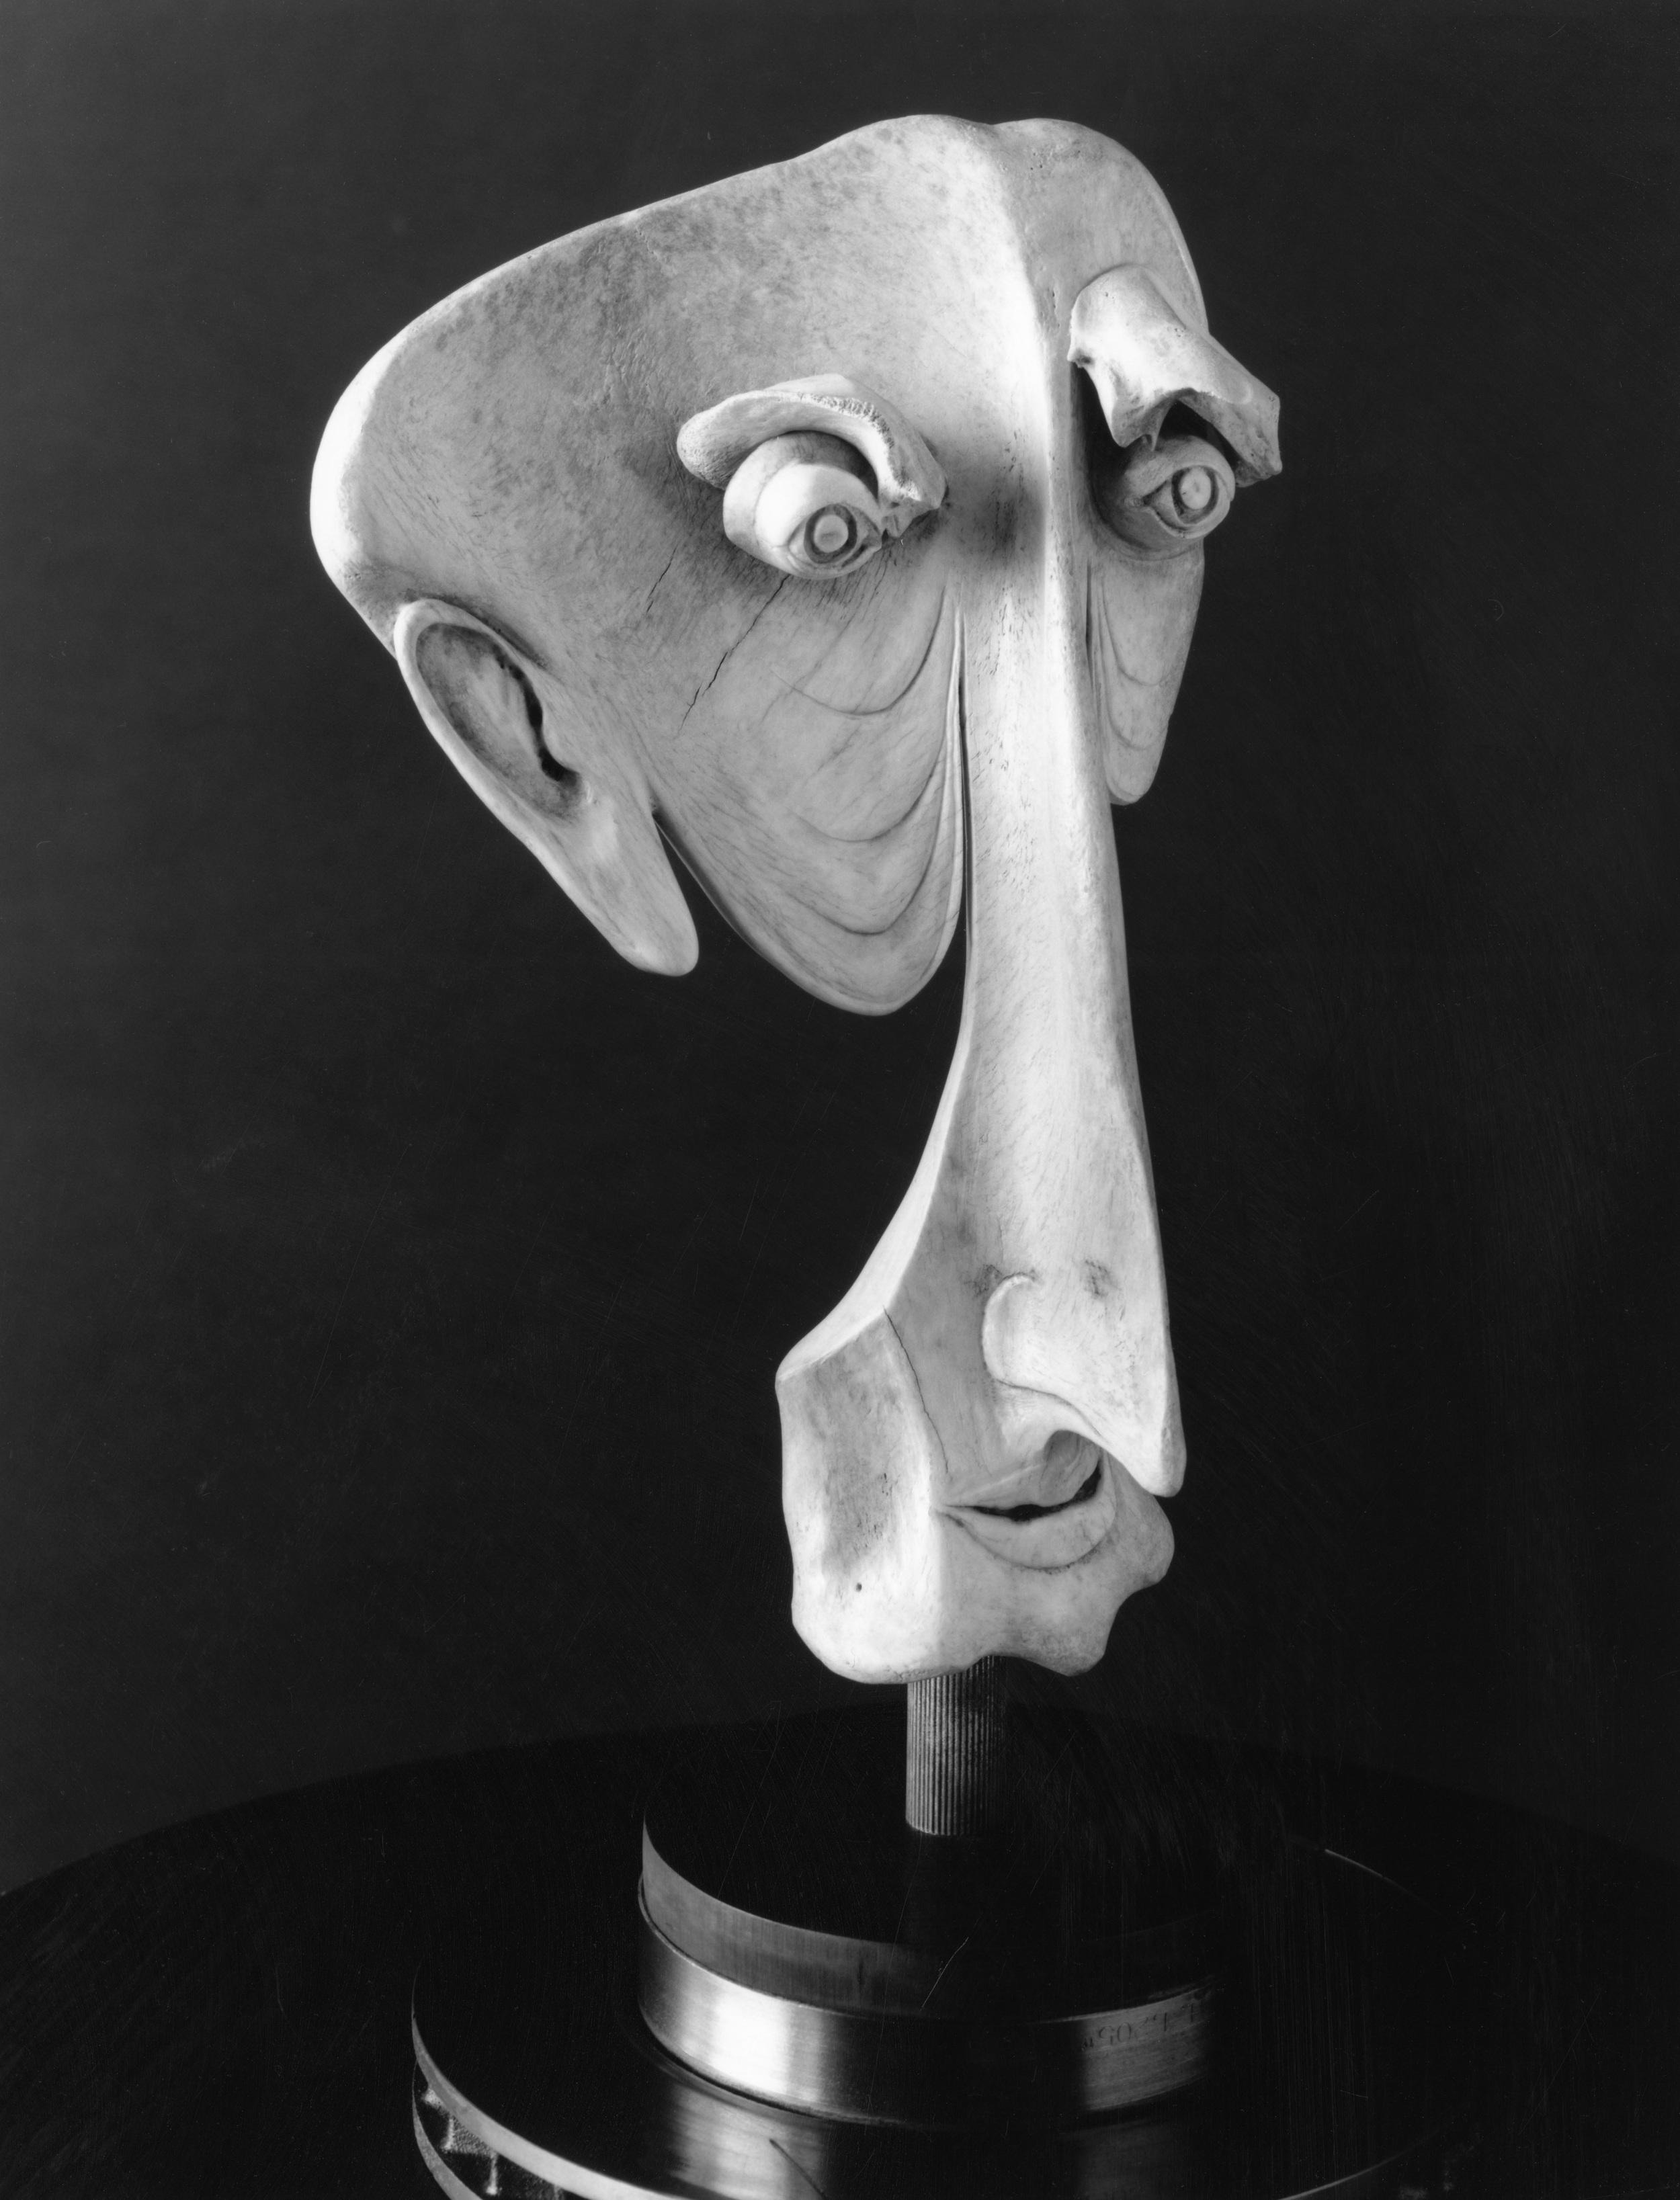 Baldy - Bone Scupture by Jerry Hardin